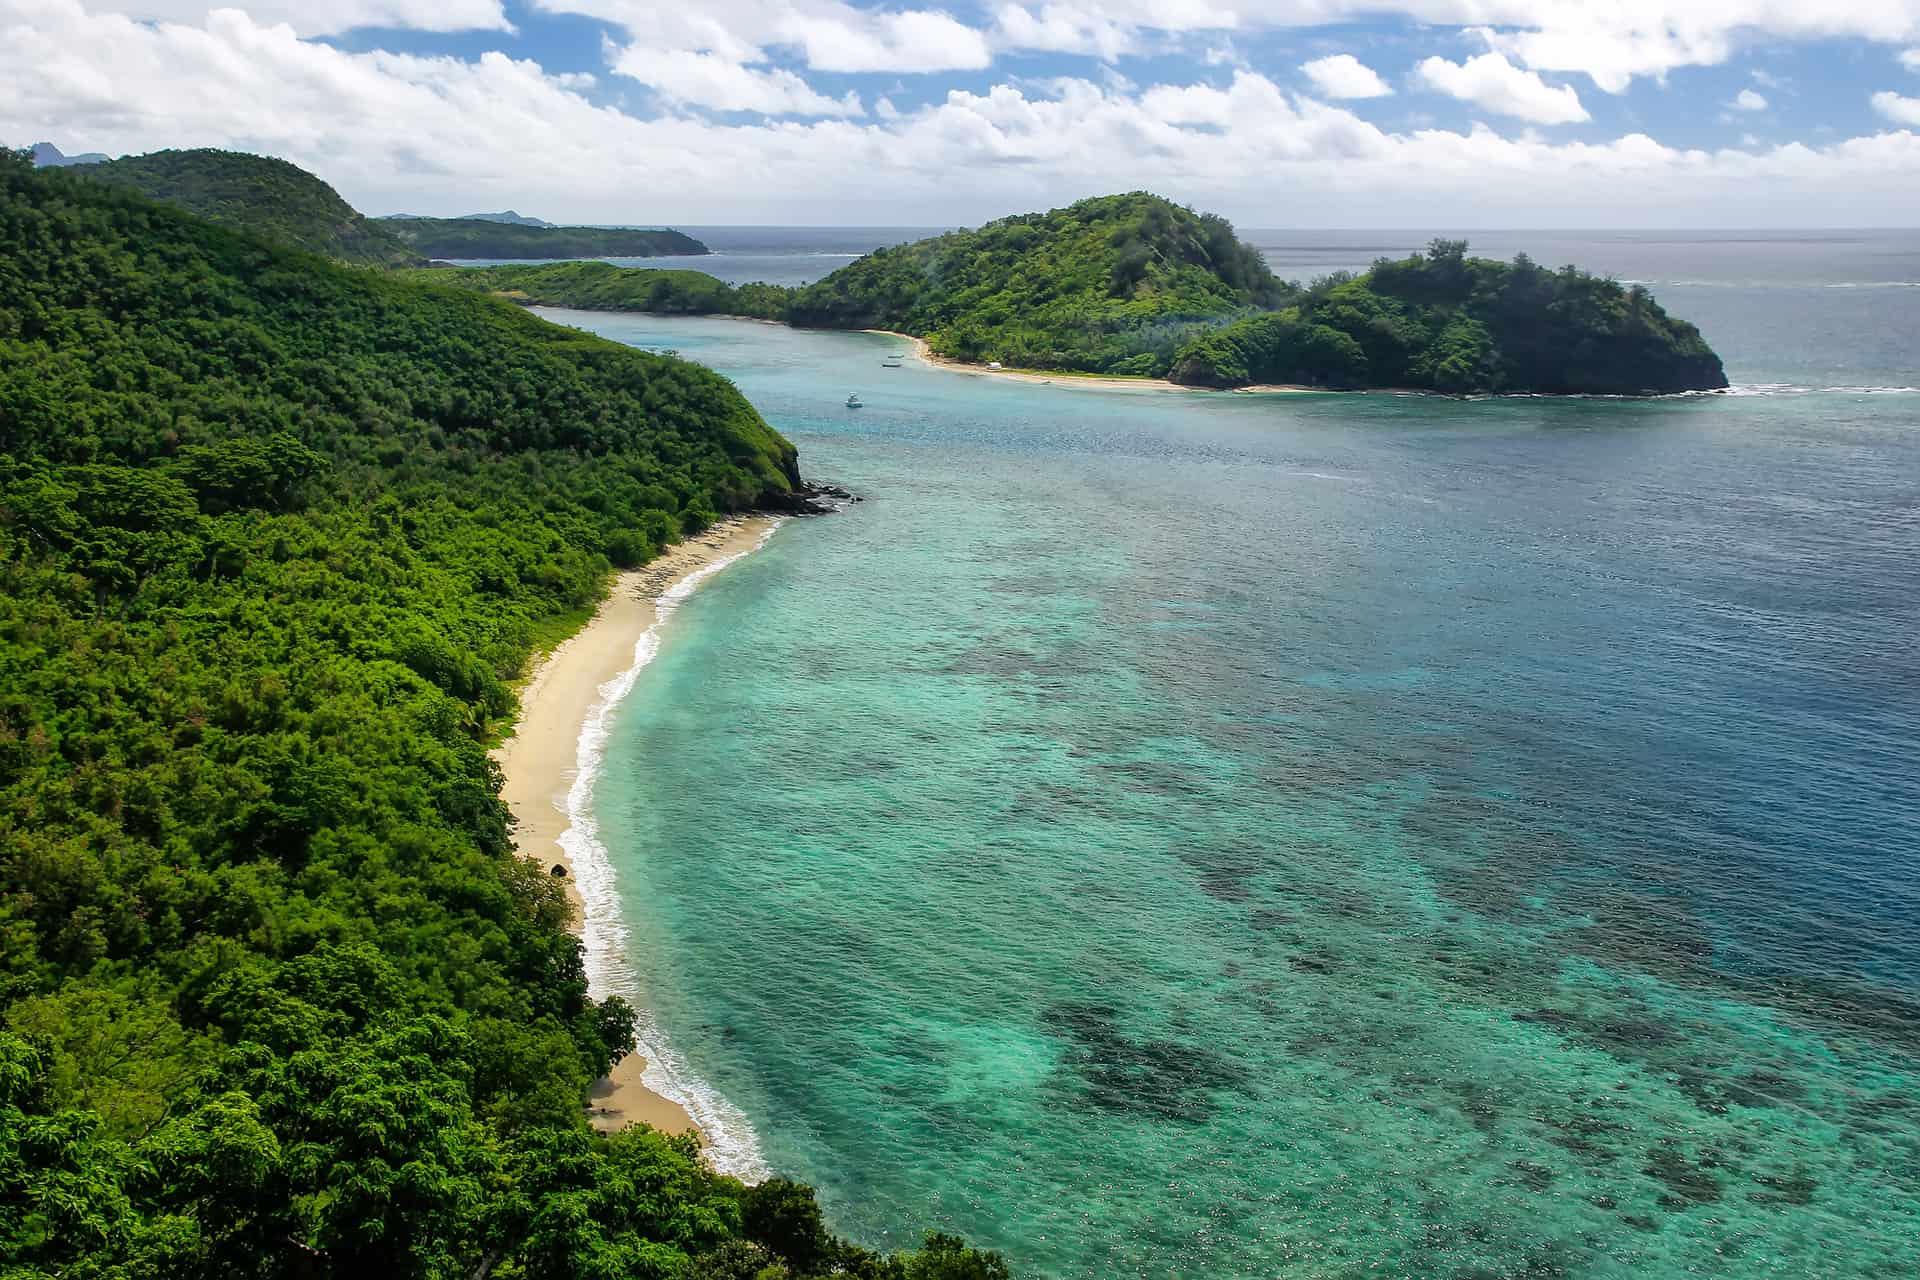 Drawaqa Island coastline and Nanuya Balavu Island, Yasawa Islands, Fiji. This archipelago consists of about 20 volcanic islands